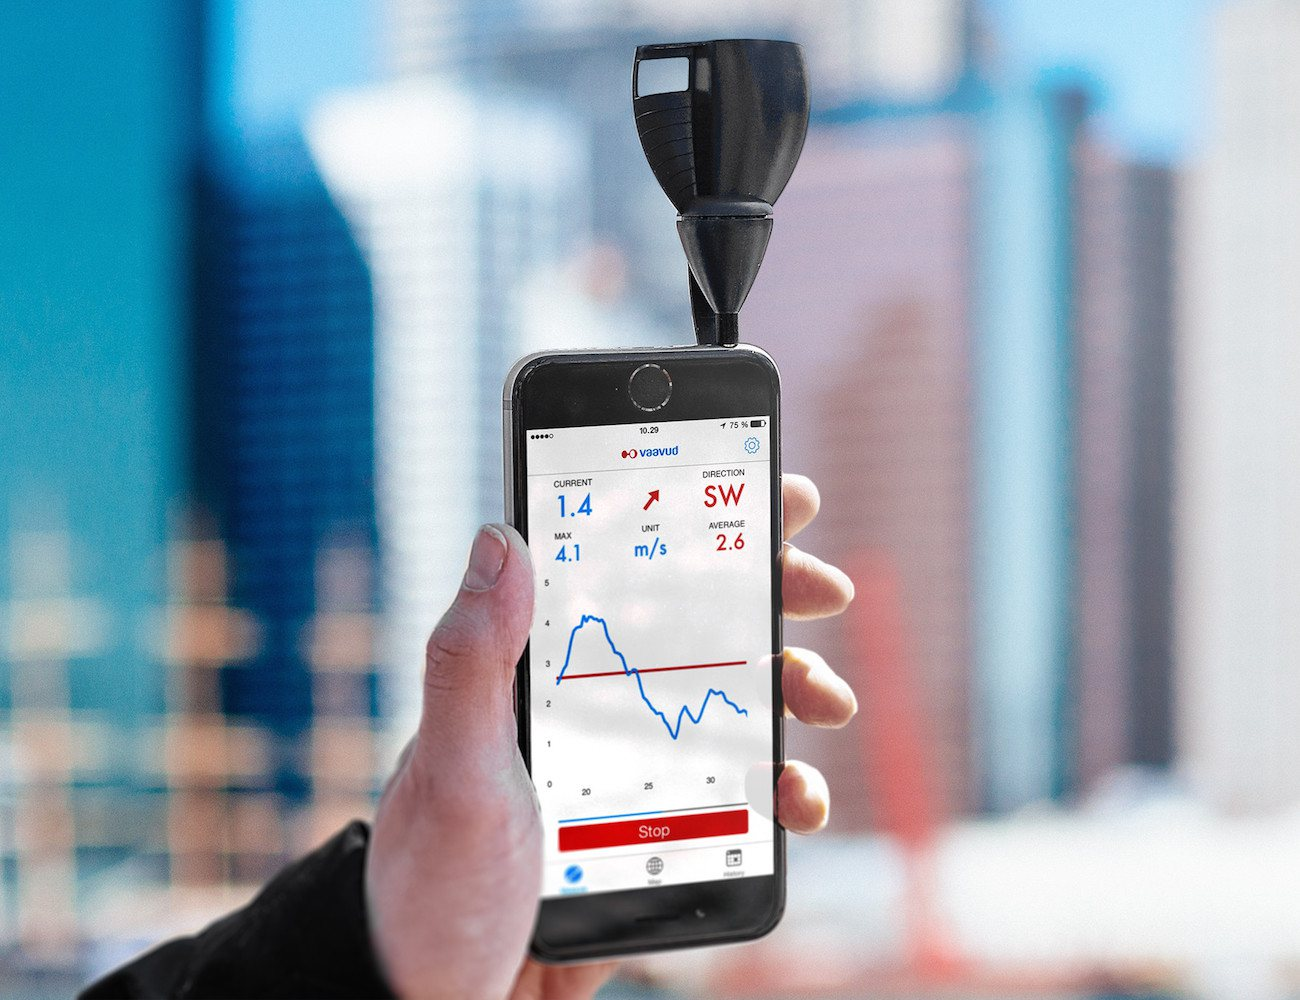 Vaavud+V2+Smartphone+Wind+Meter